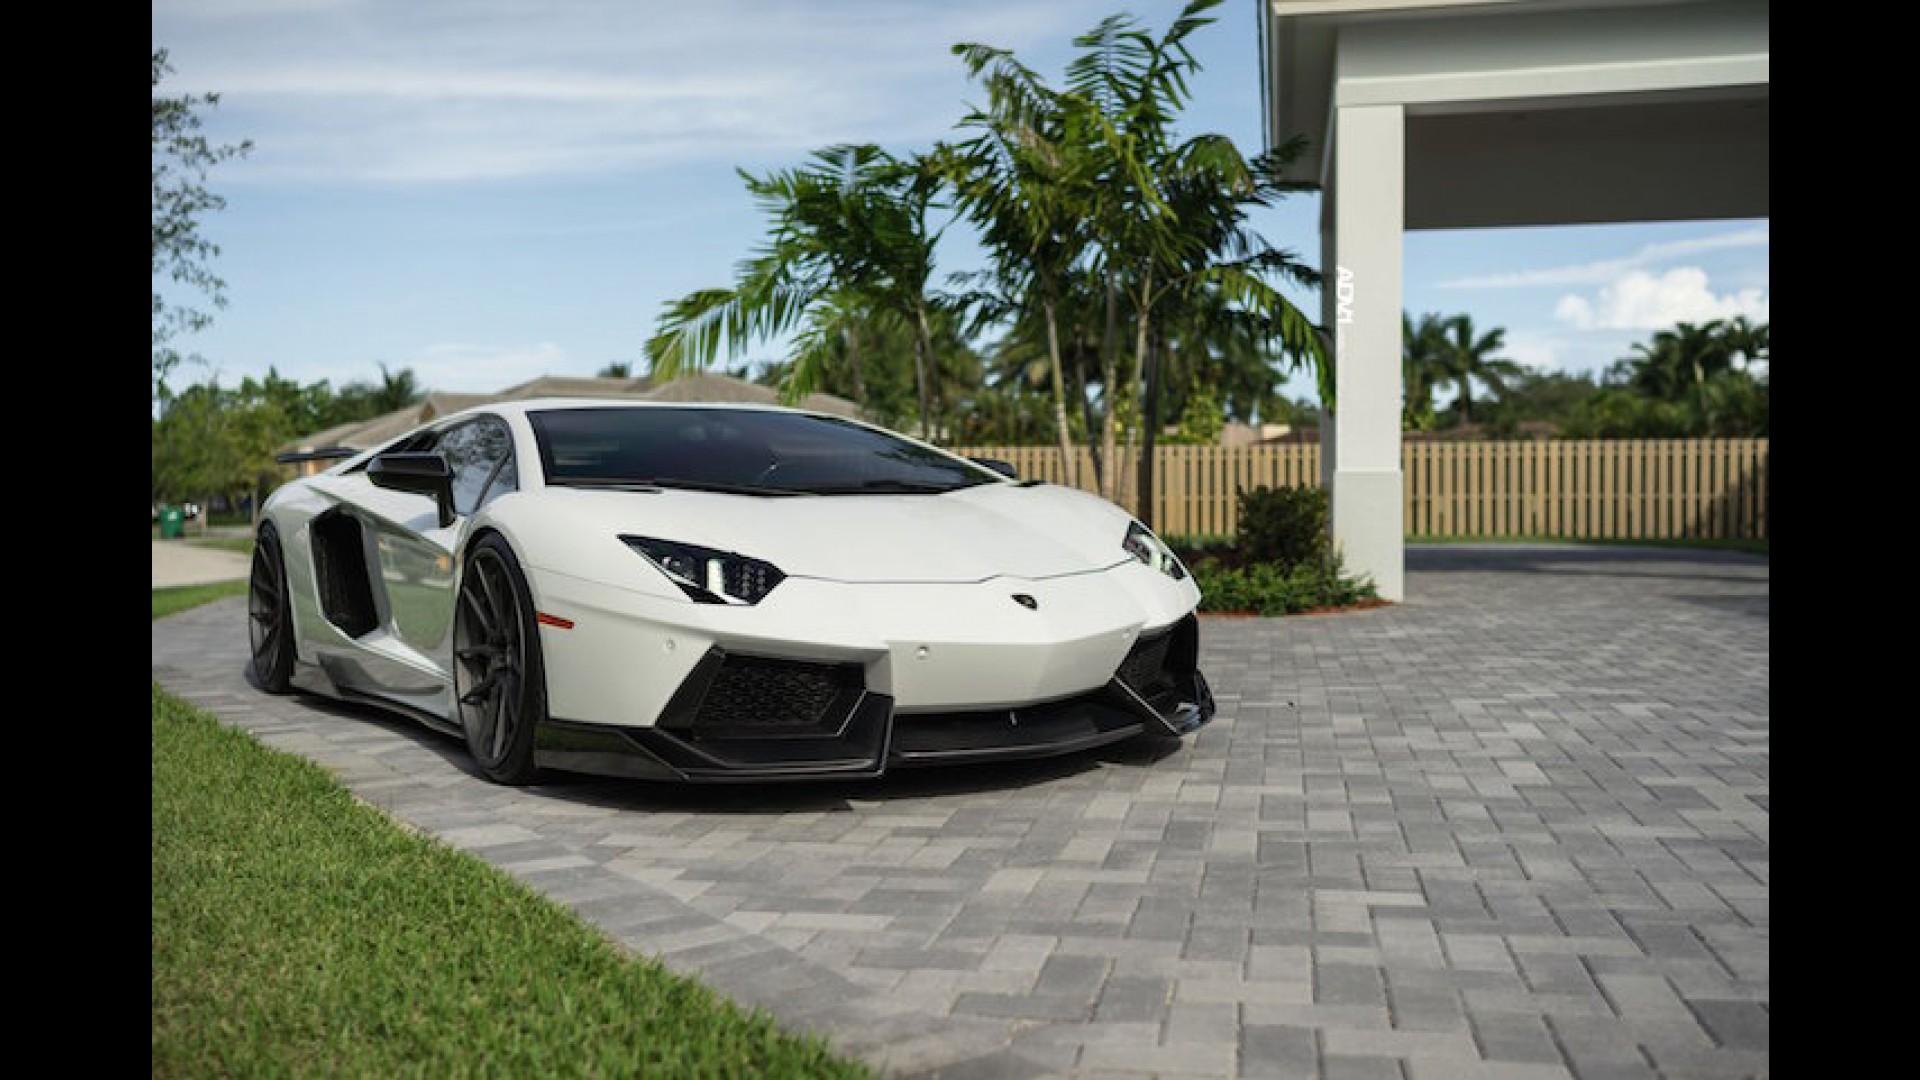 780-HP Lamborghini Aventador Looks Mean On ADV.1 Wheels